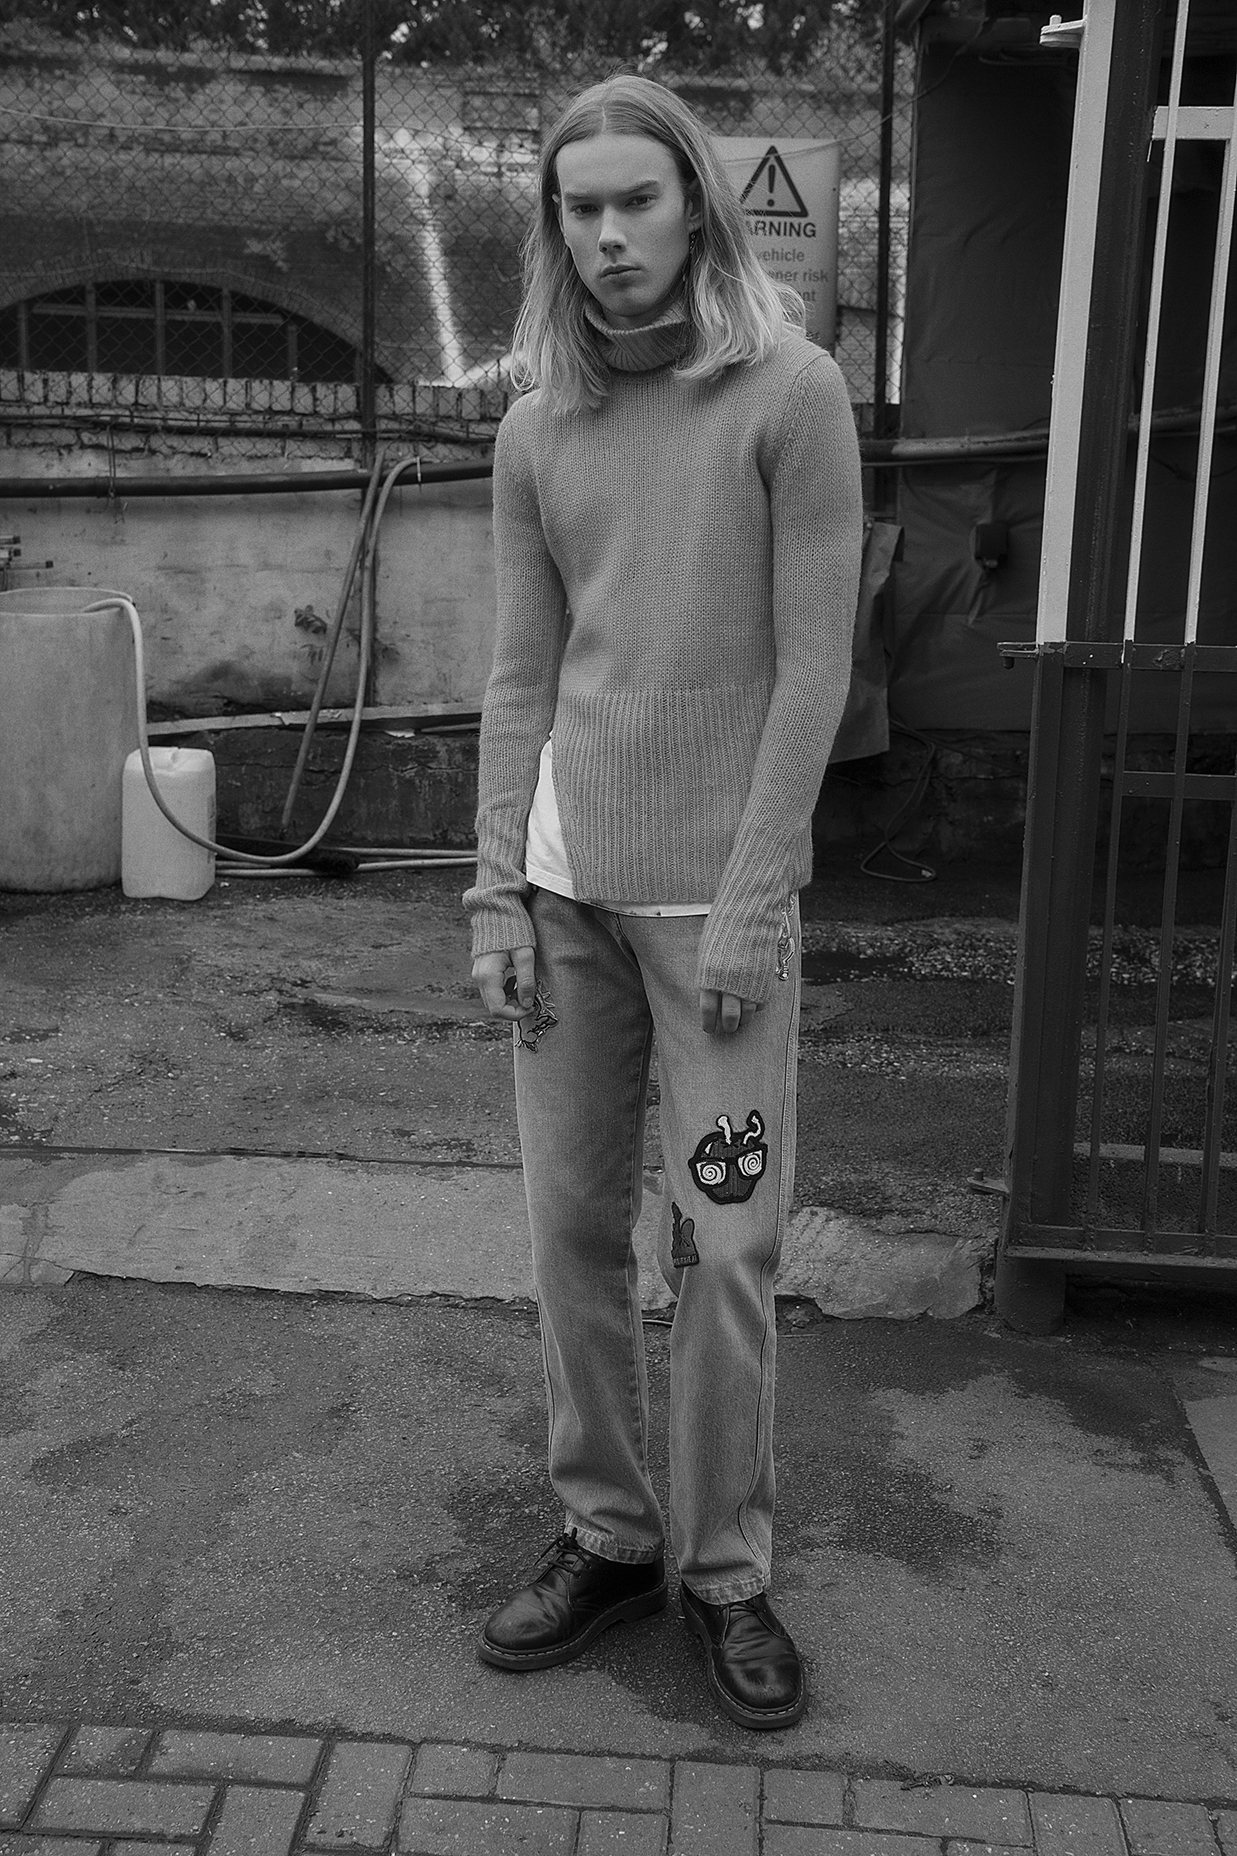 turtleneck  monki  t-shirt + earring  models own  jeans  kenzo  shoes  dr martens